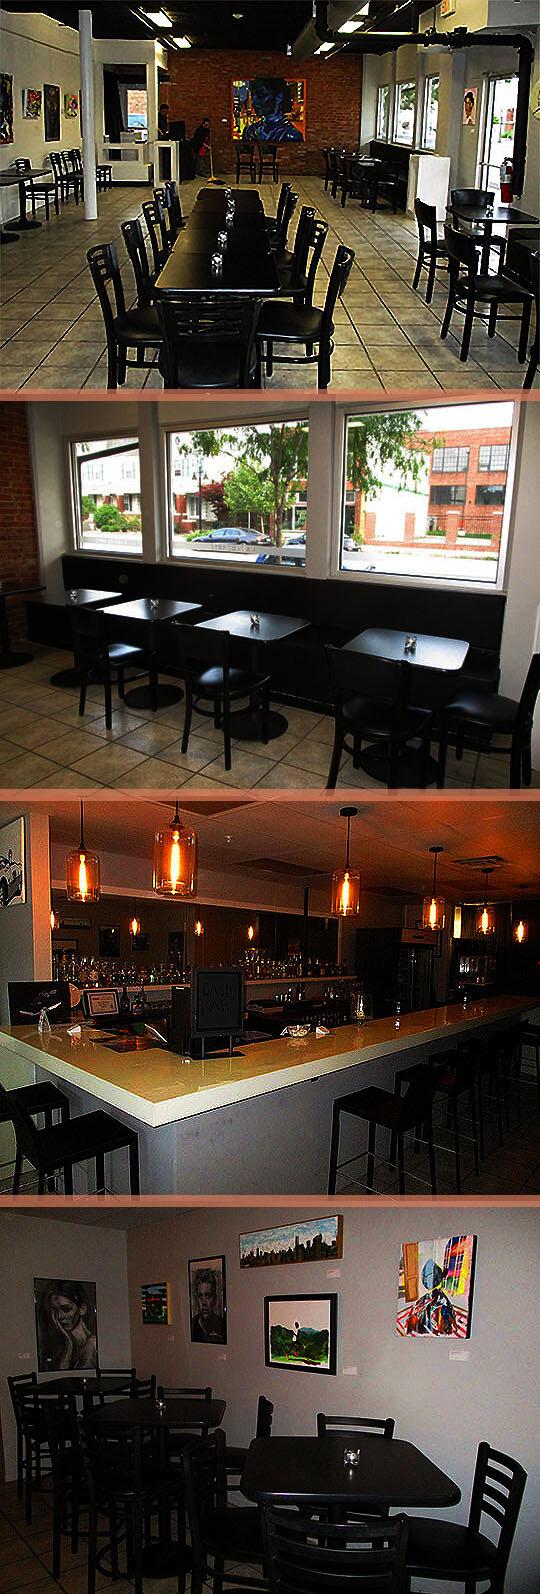 6. diningroombar_9-23-19.jpg